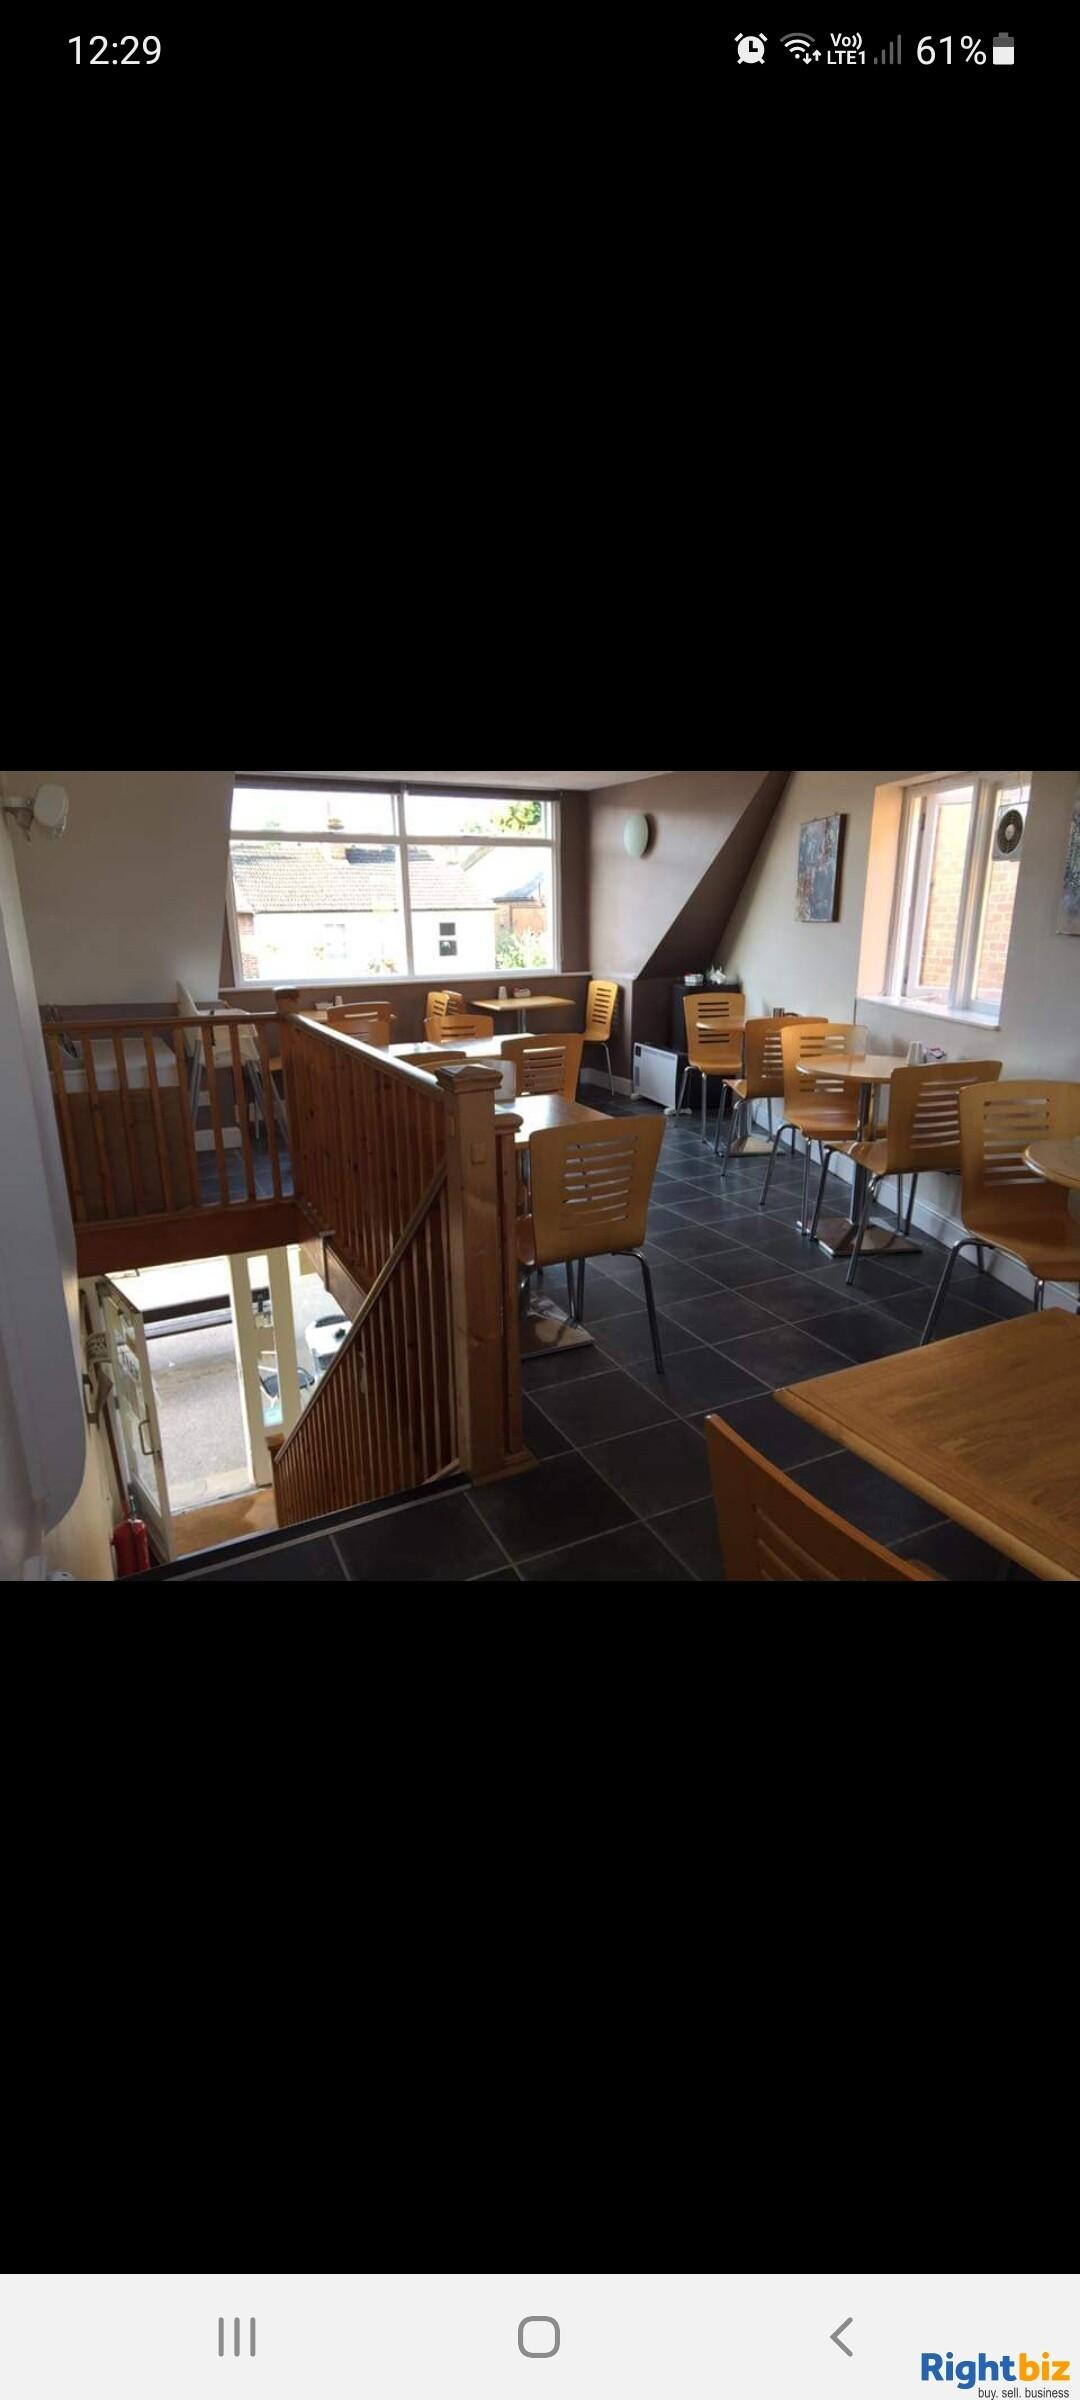 Established community cafe desirable area - Image 3